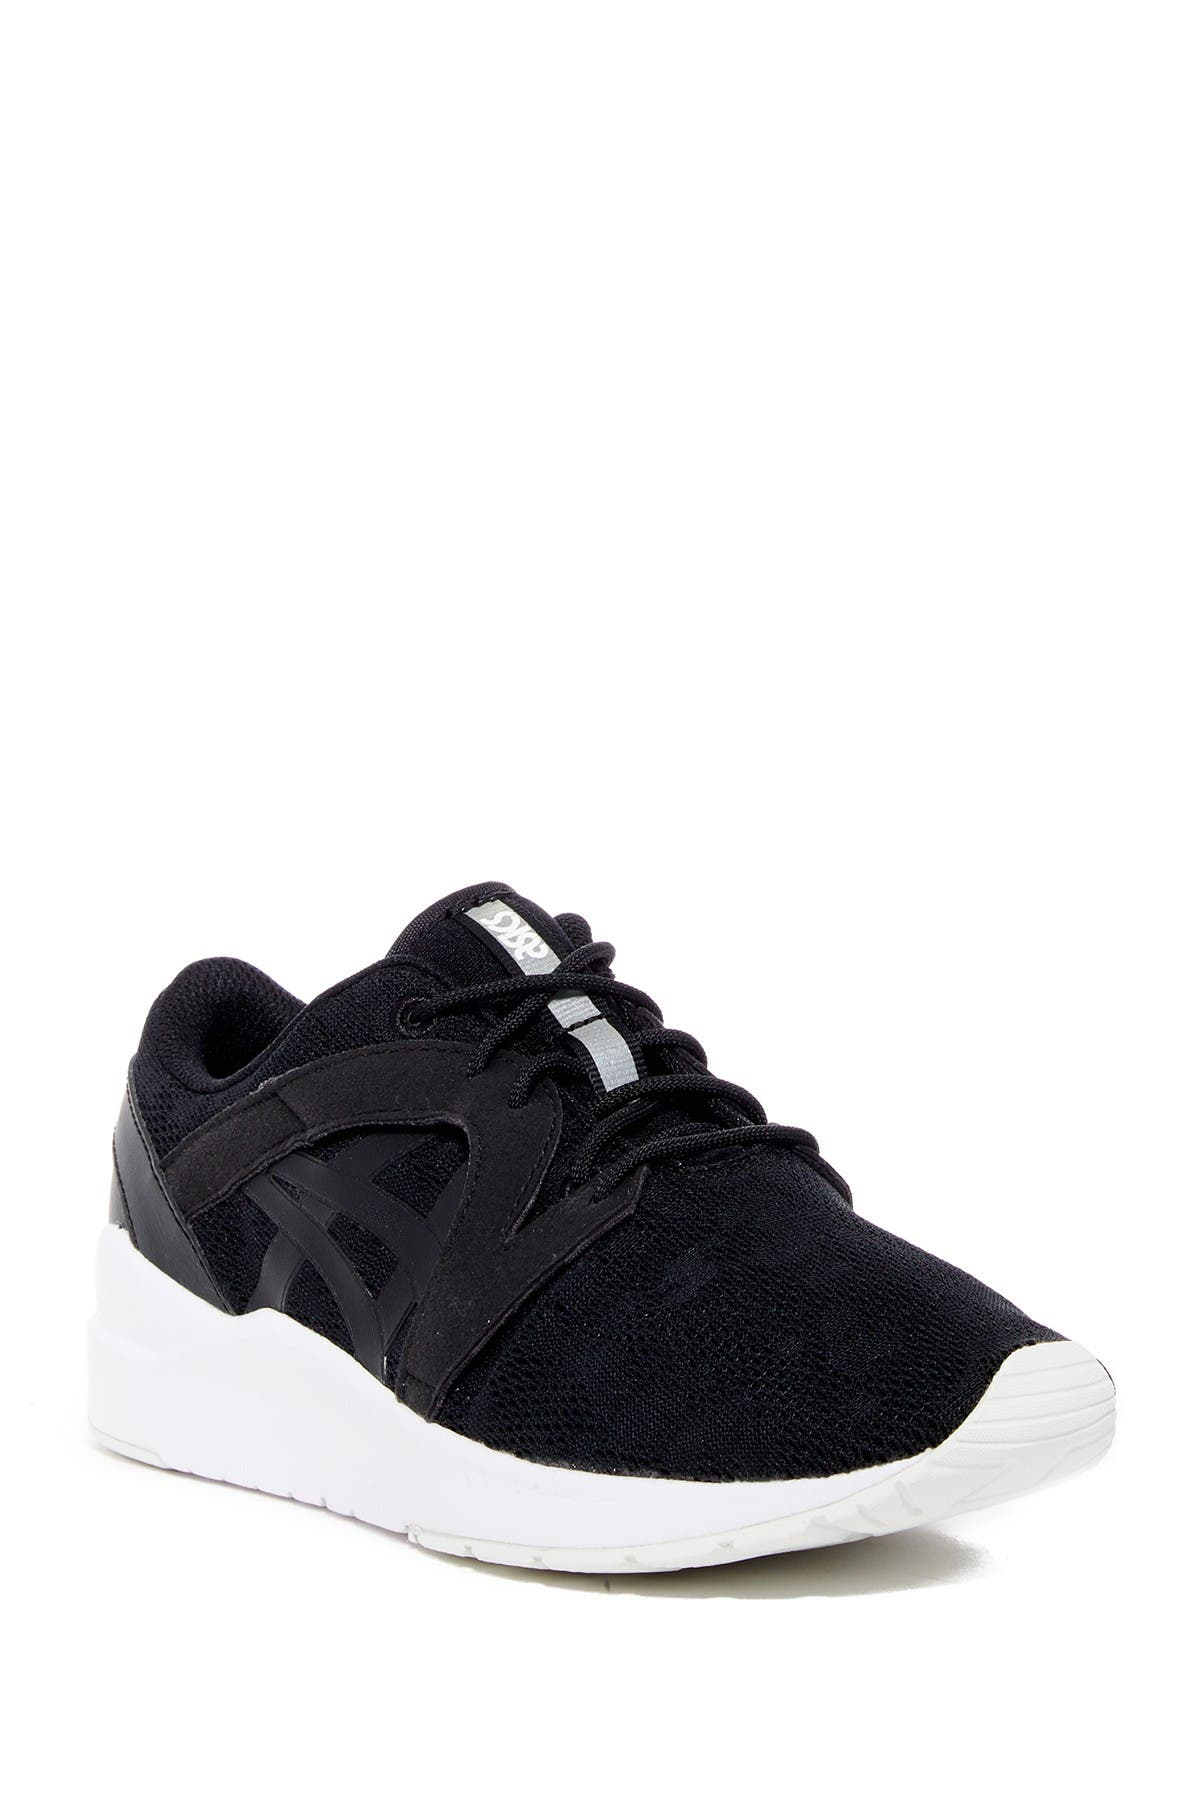 Image of ASICS Gel-Lyte Komachi Sneaker